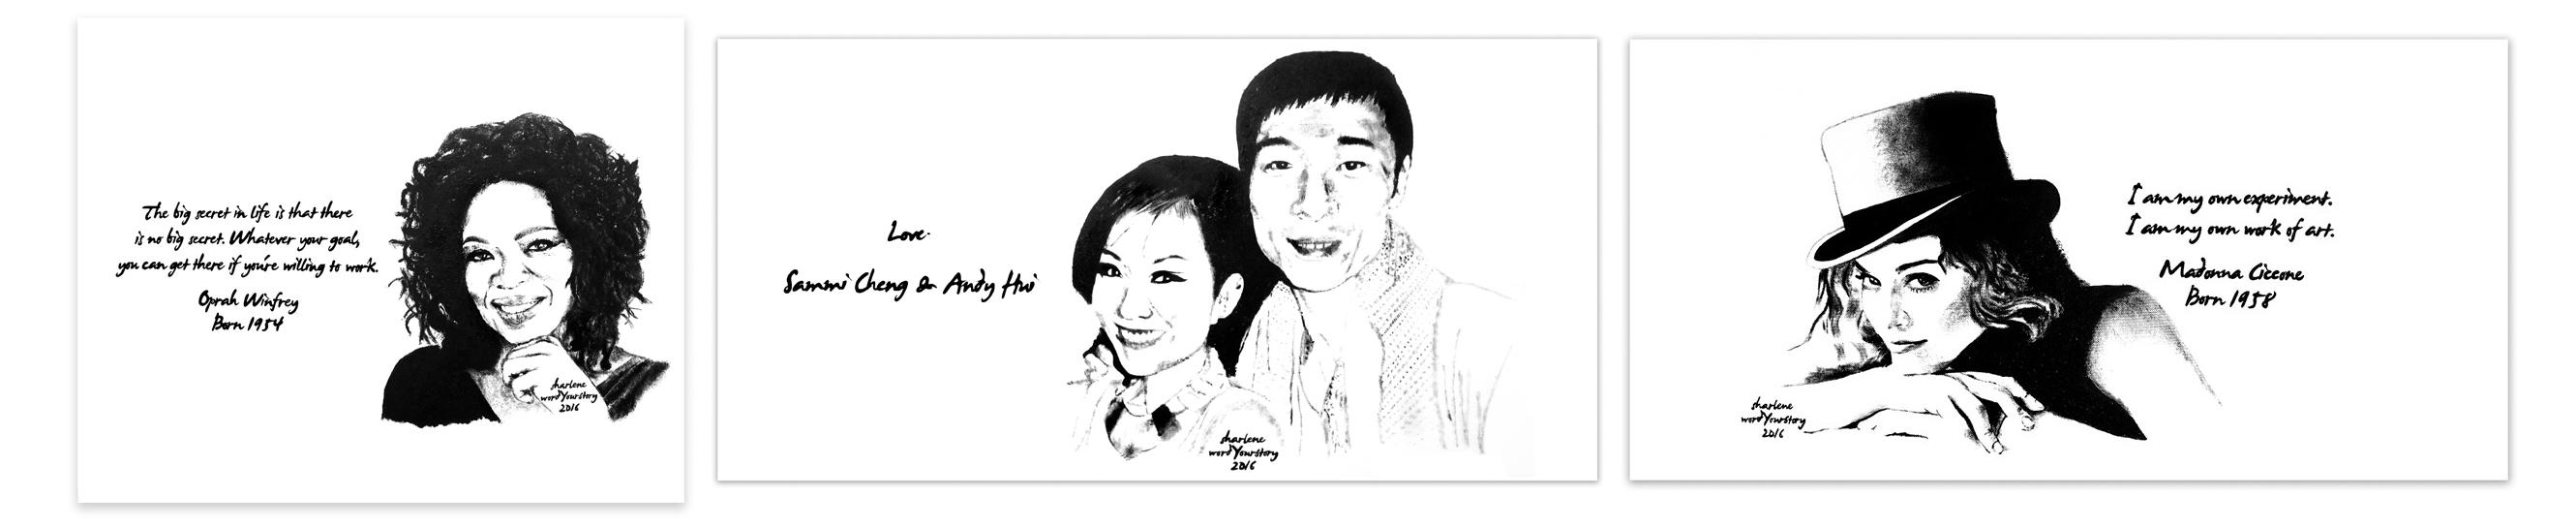 LKY_$1500_NA4